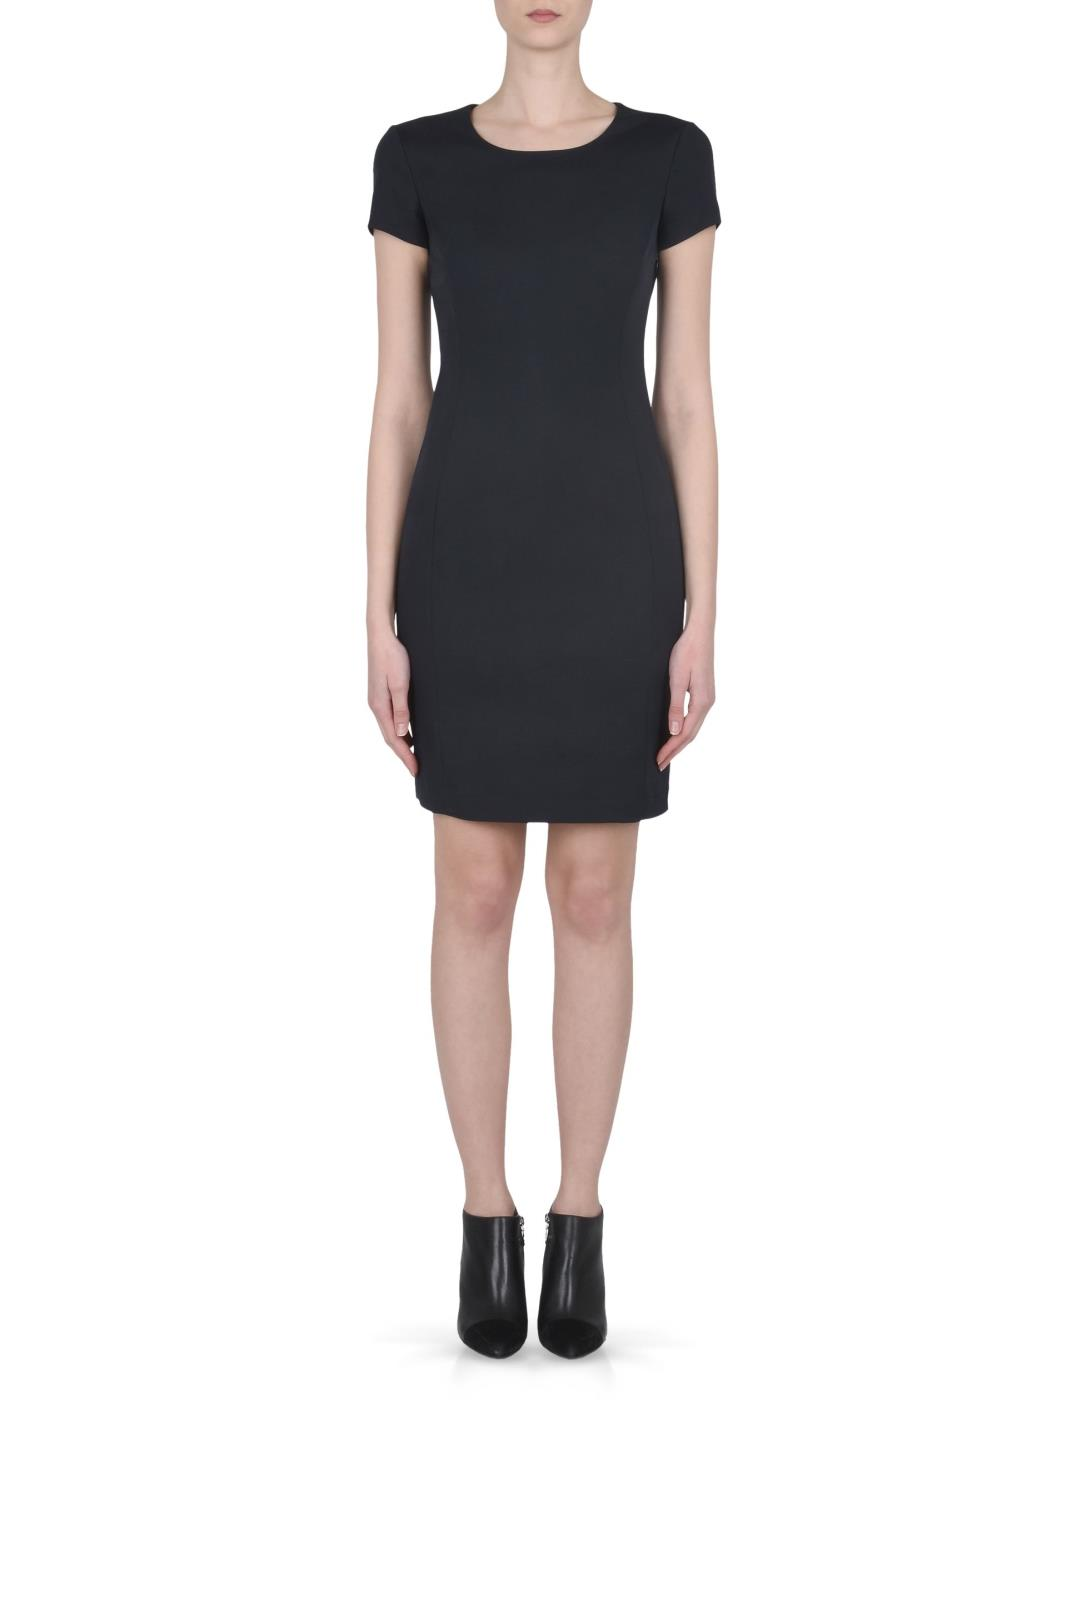 huge selection of 67843 79d29 Aj Armani Jeans Abito 3y5a49 5nysz | Giannini Shop Online